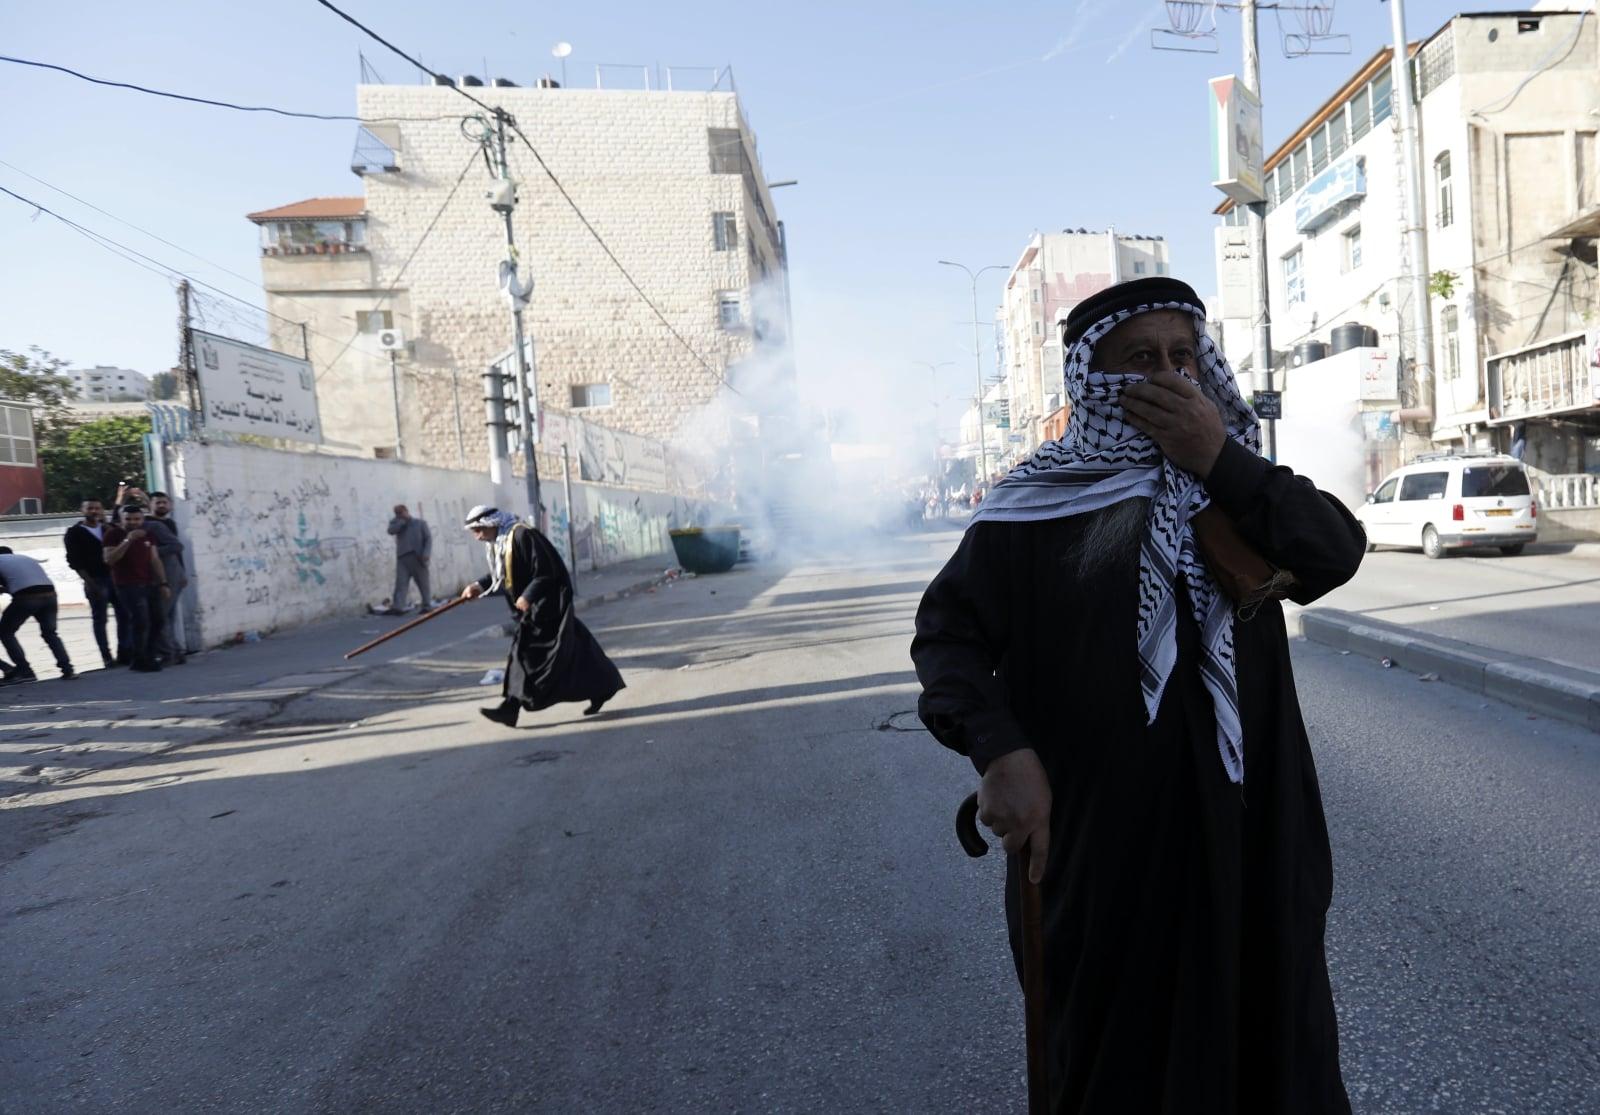 Konflikt w Palestynie fot. EPA/ABED AL HASHLAMOUN